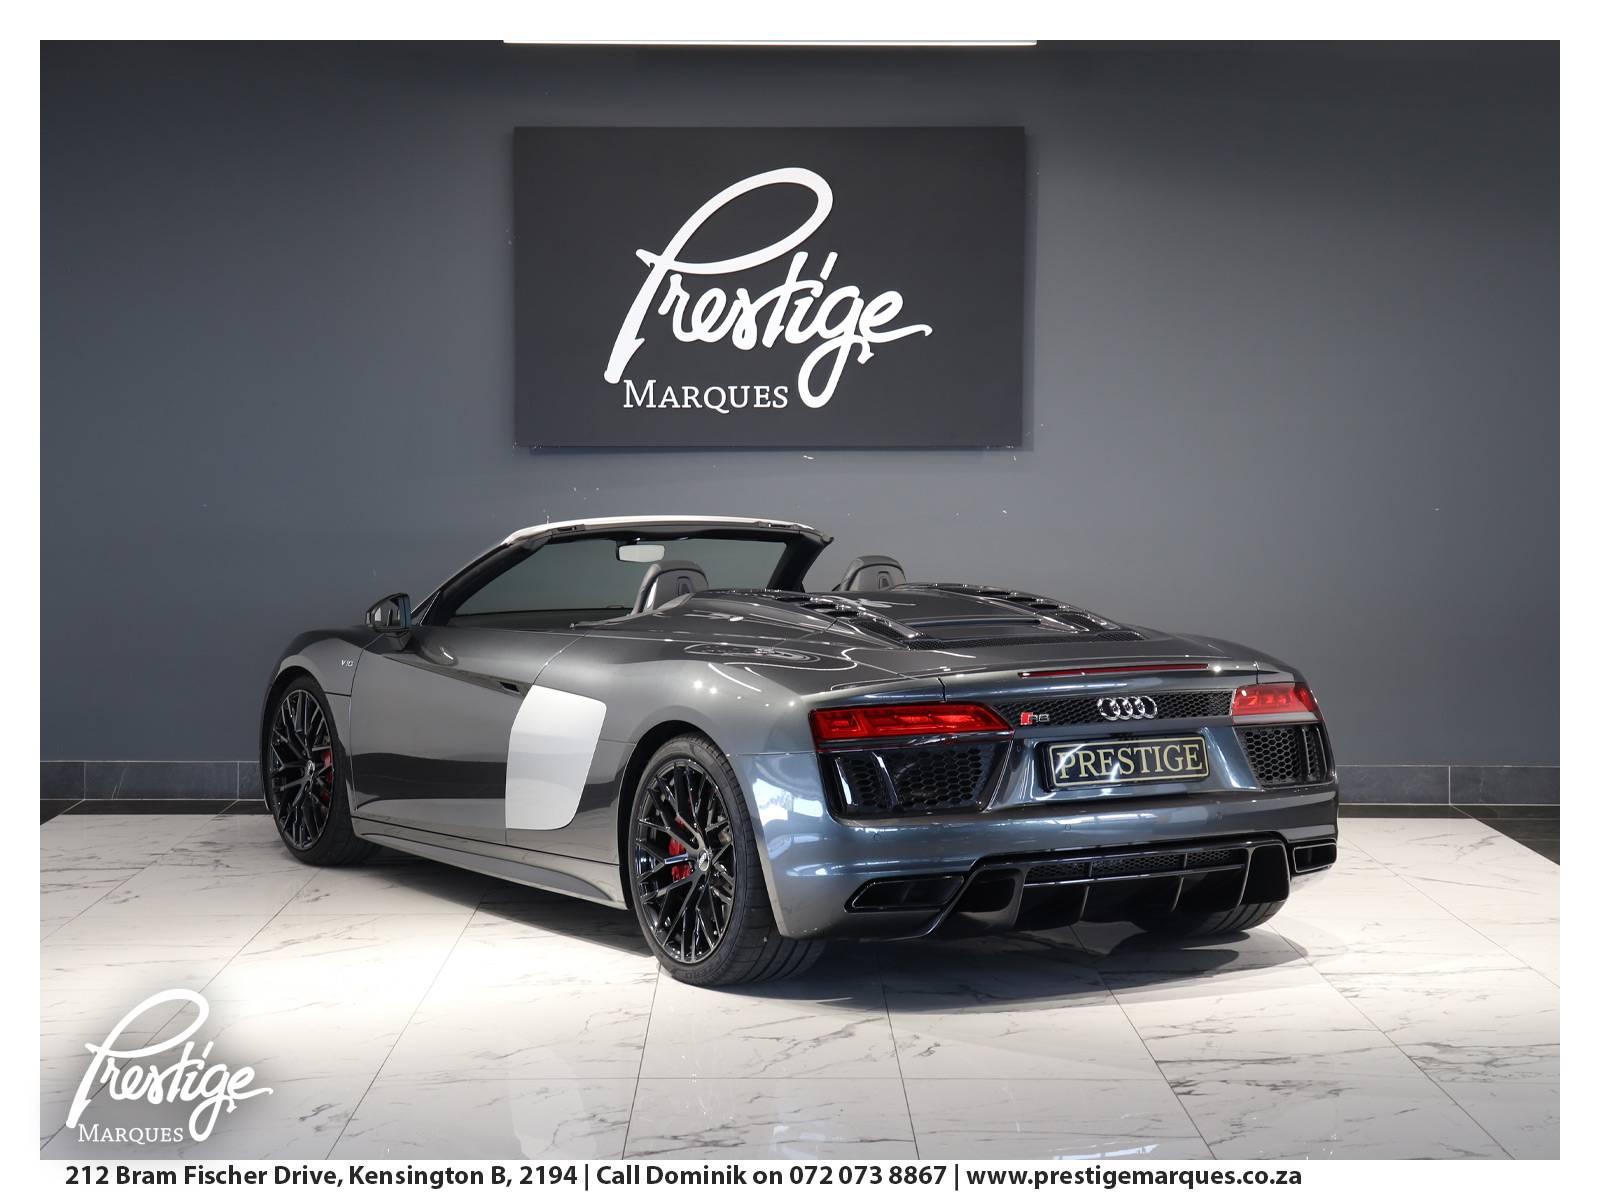 2019-Audi-R8-Prestige-Marques-Randburg-Sandton-9